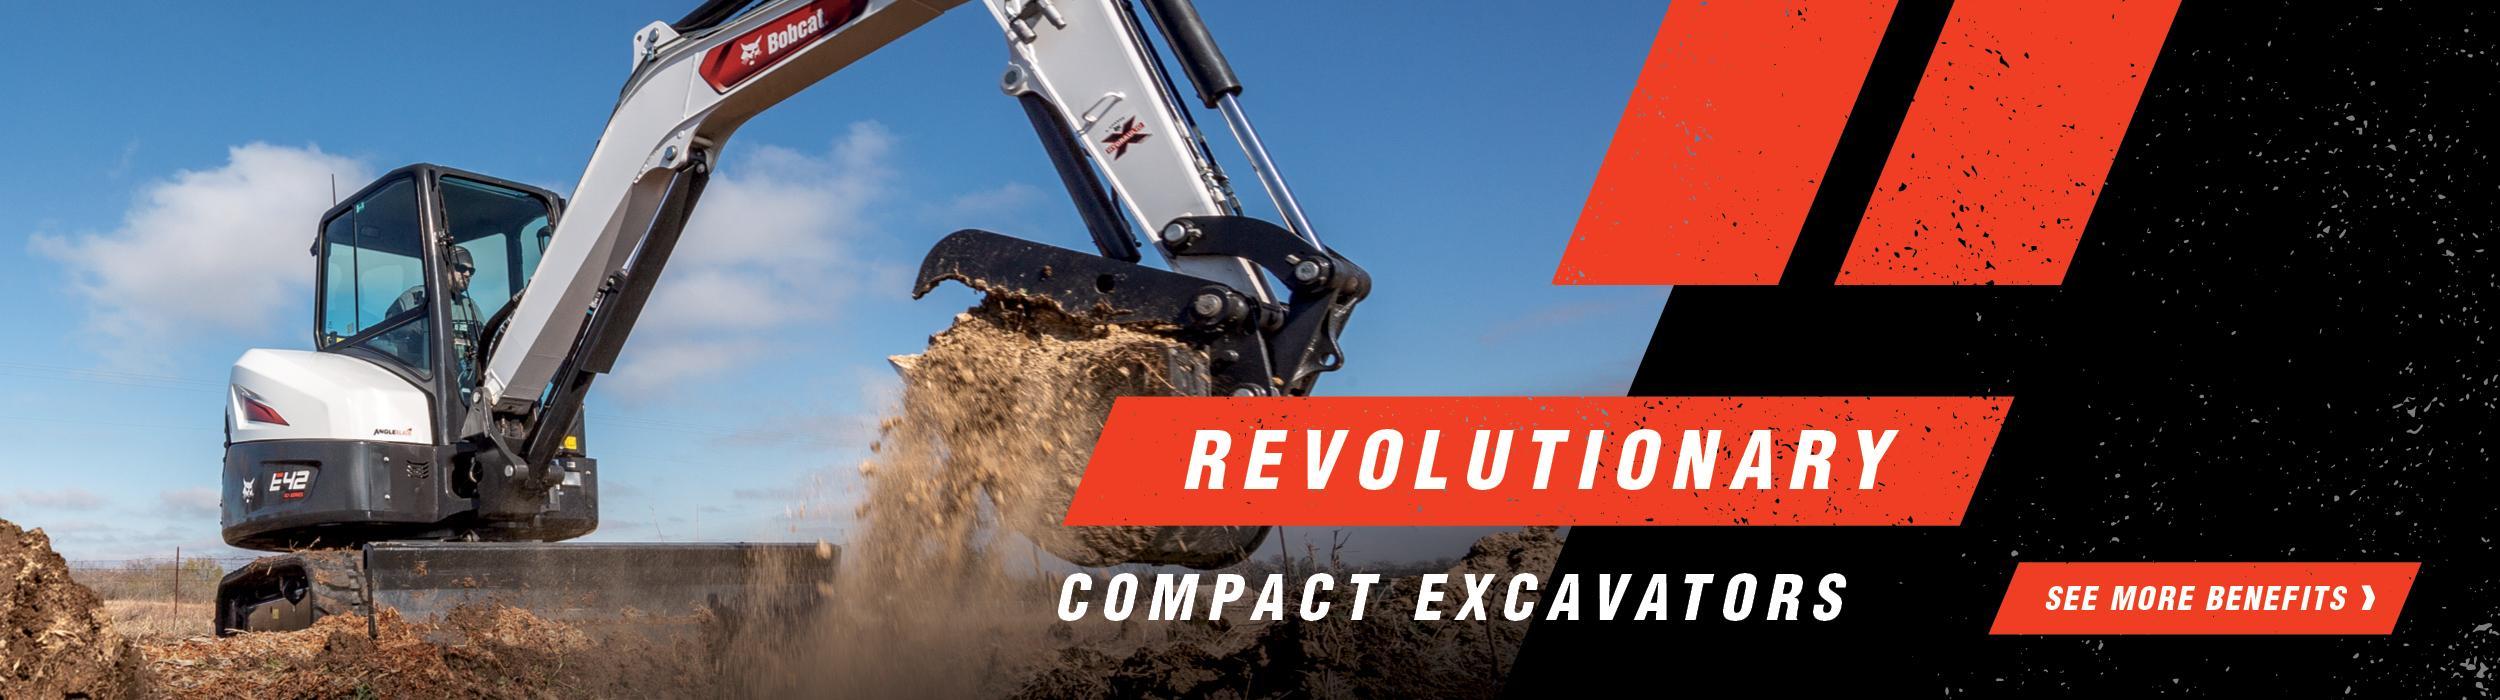 Graphic of Revolutionary R2-Series Compact Excavators